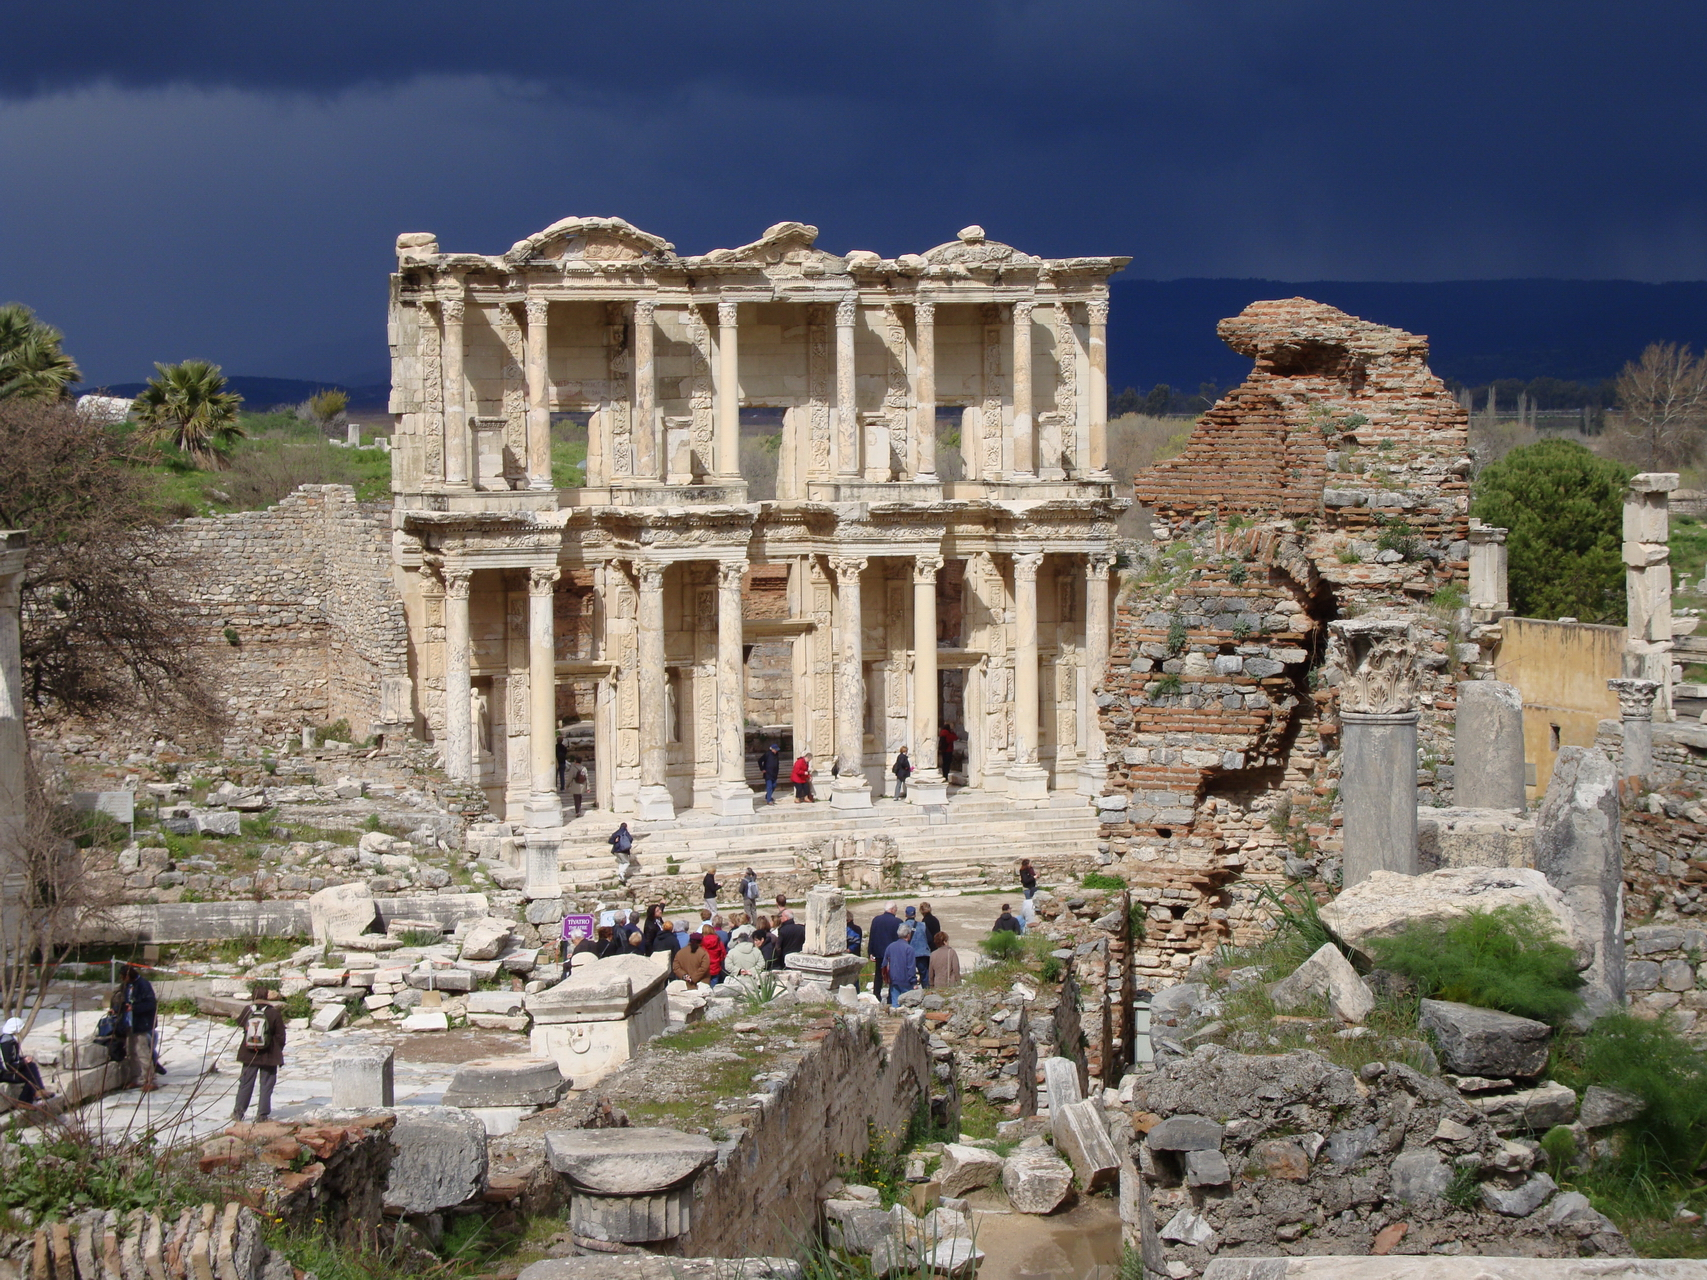 Paul-3MJ-Ephesus15-2009-03-19 02-34-55-